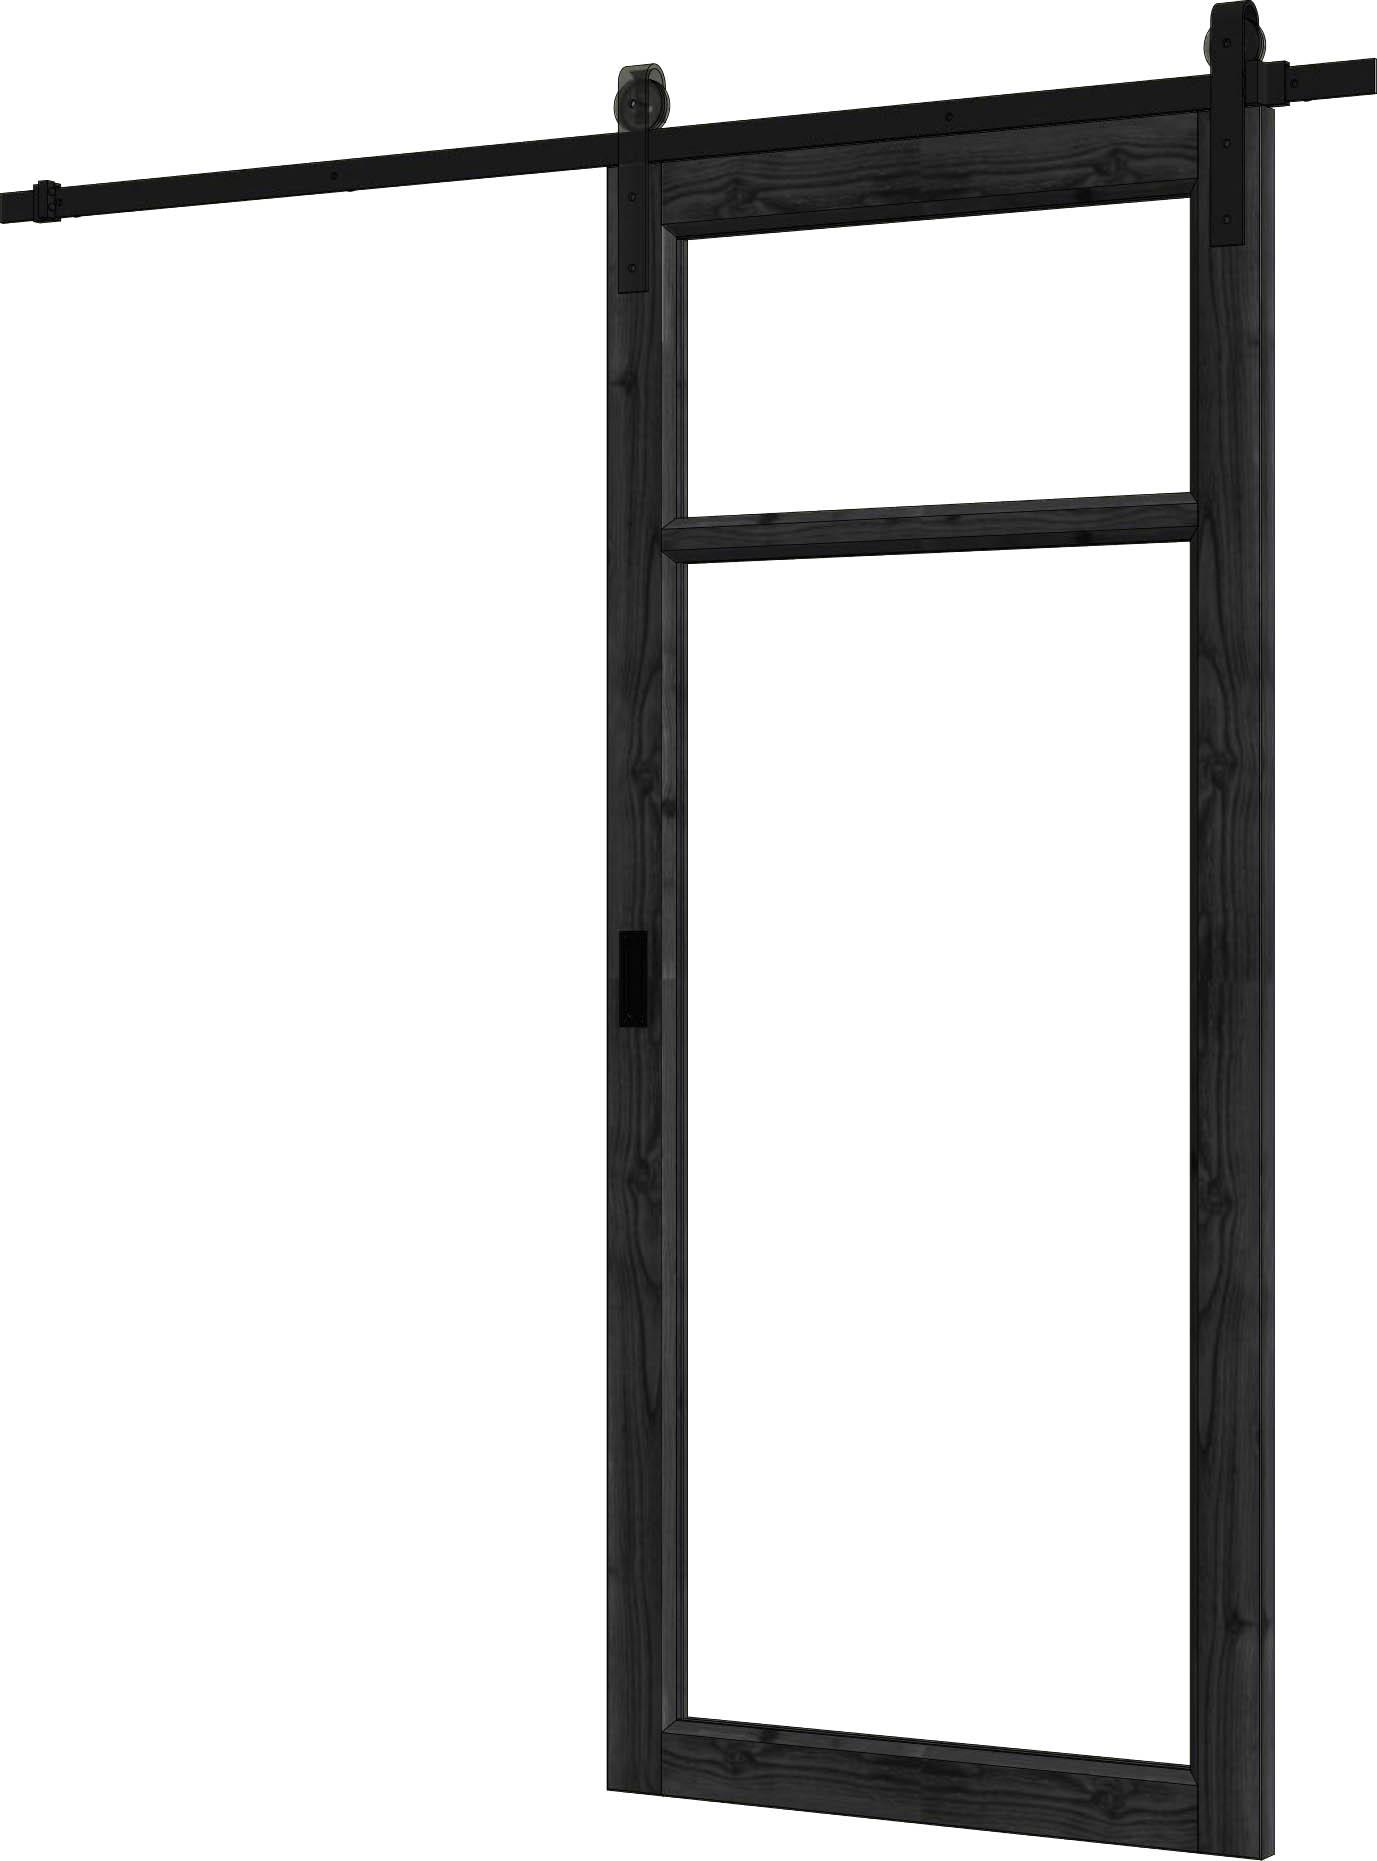 Trendhout | Steel Look Schuifdeur Enkel | U2 | 89 x 206 cm